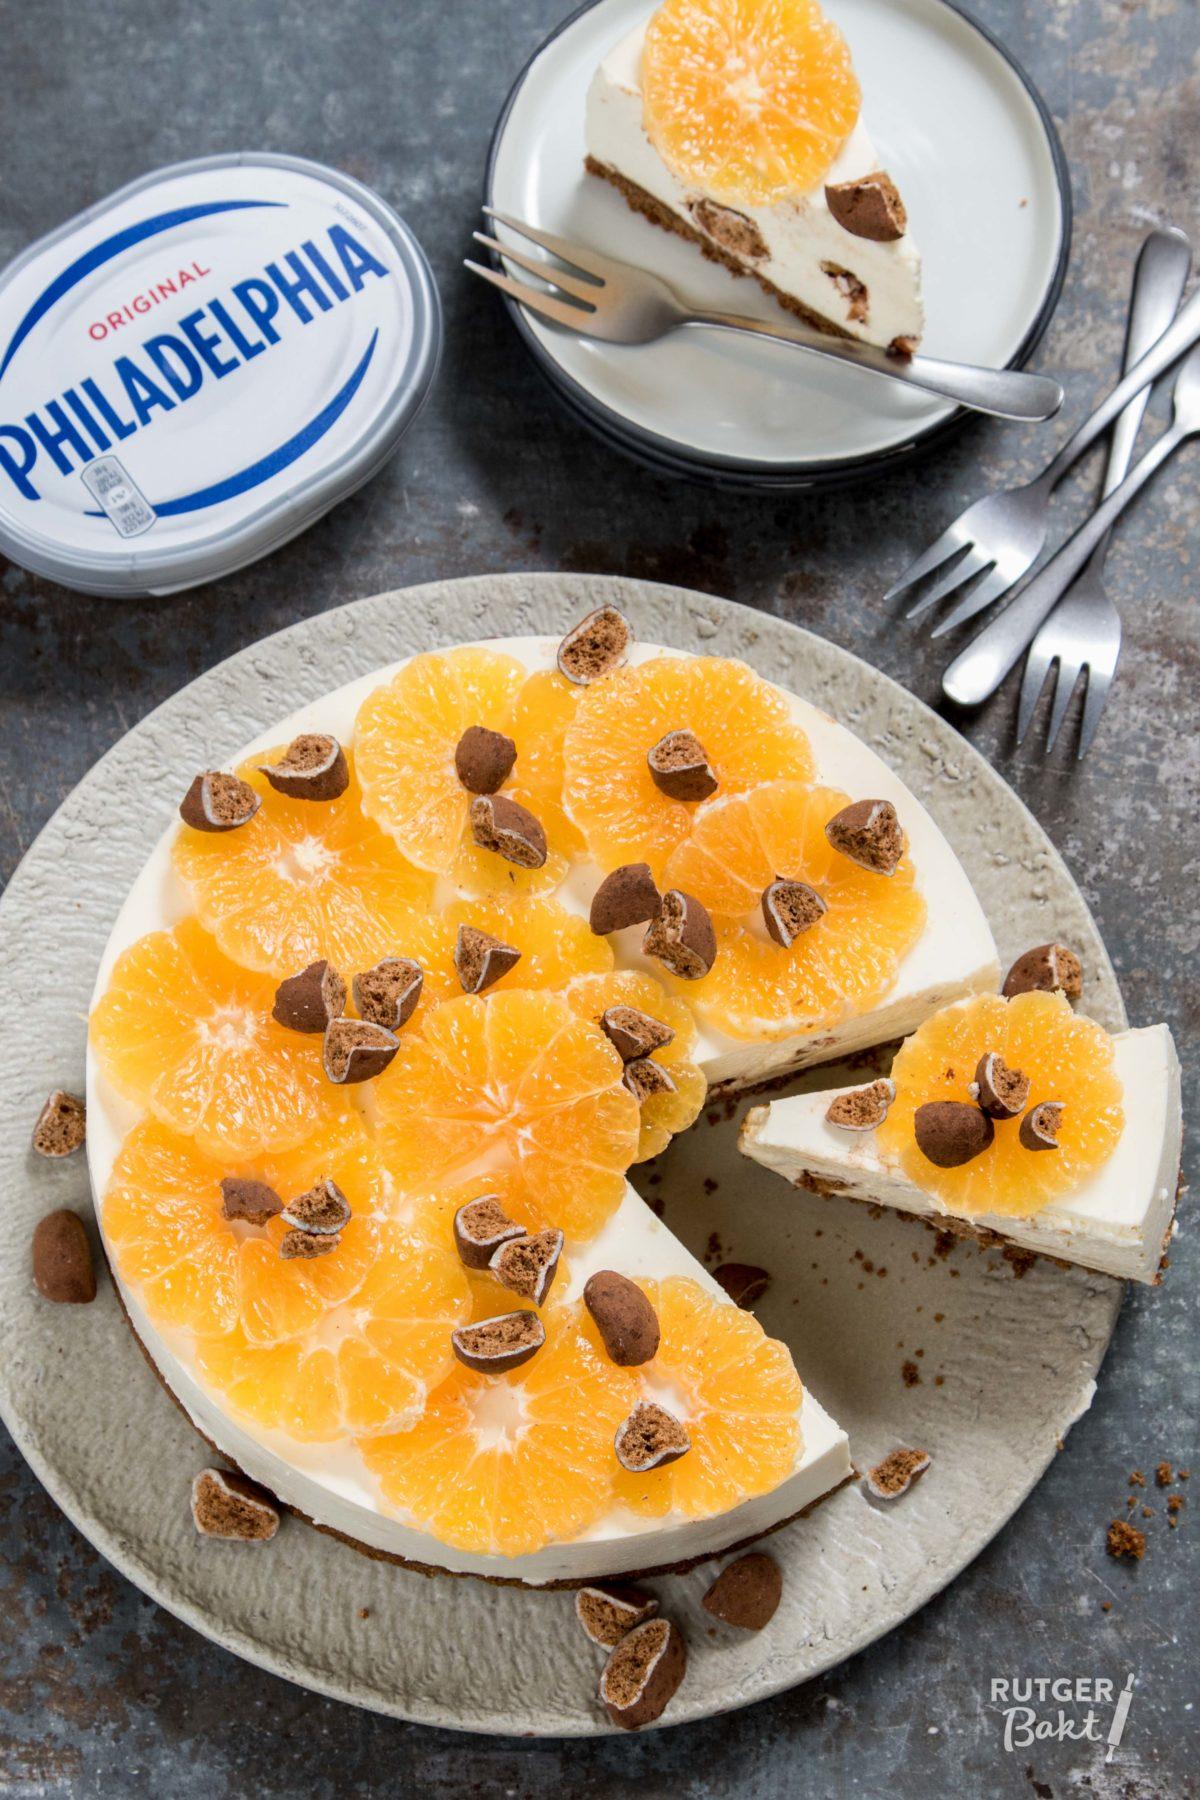 No-bake Philadelphia cheesecake met kruidnoten en mandarijn